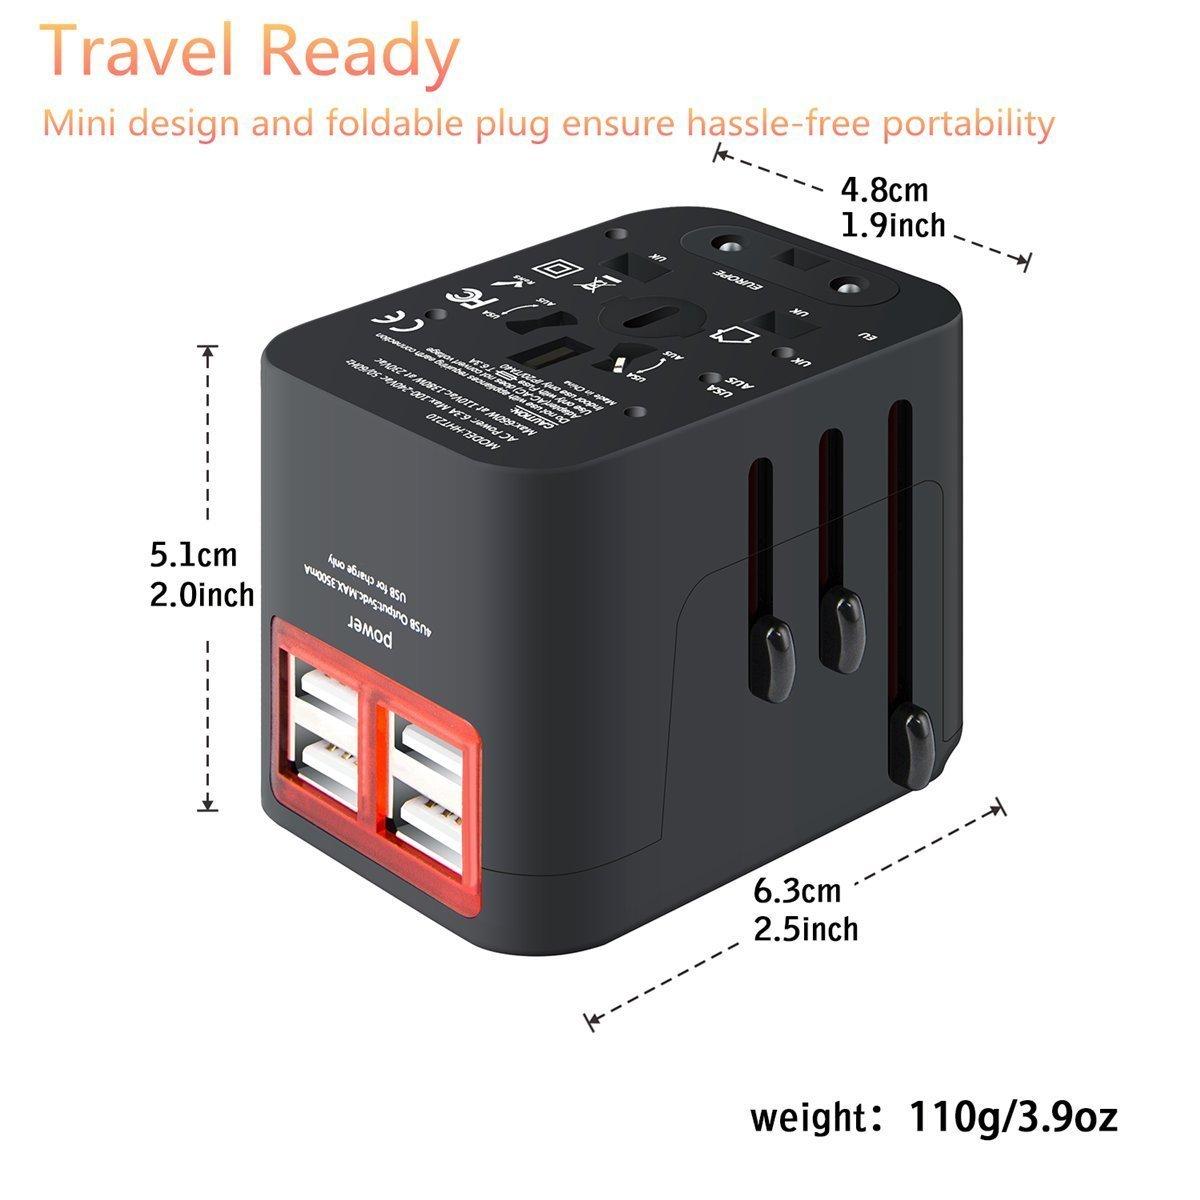 AKNICI Universal Reiseadapter Reisestecker Steckdosenadapter Stromadapter mit 4 USB-Ports 17.5W//3.5A International Adapter f/ür USA China EU England Japan AU Asien /Über 150 L/ändern Schwarz